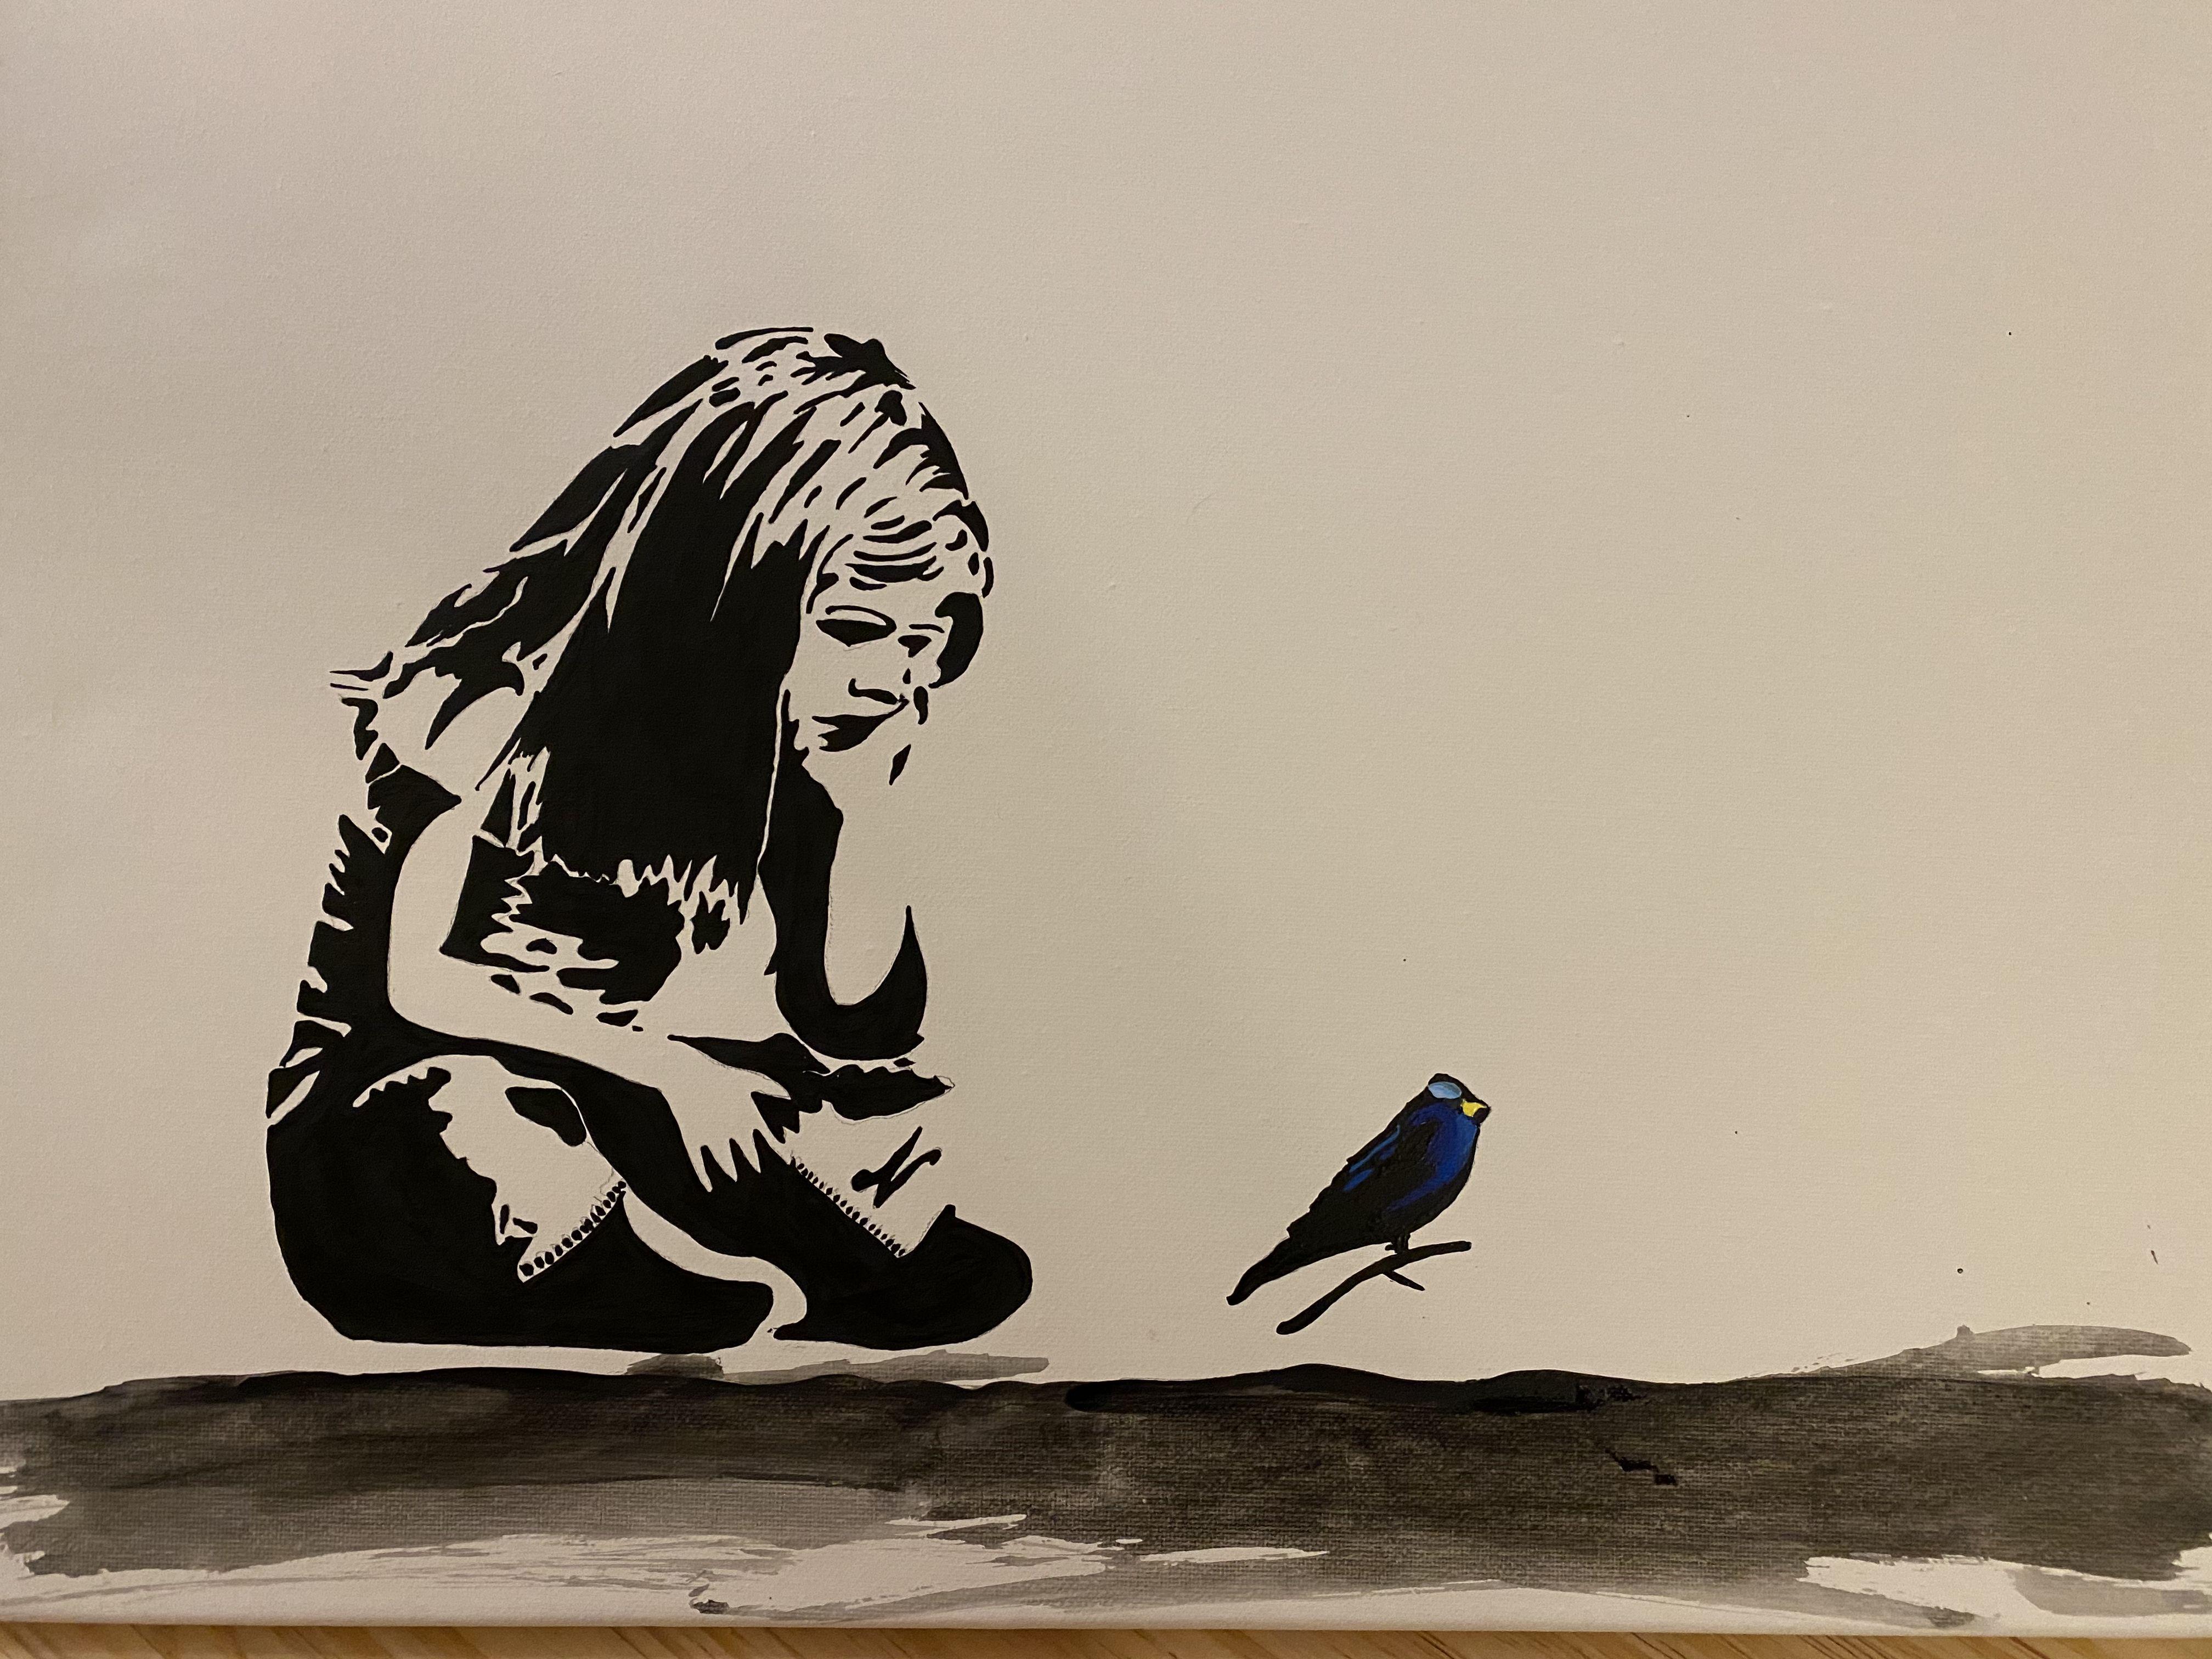 #diy #banksy #banksyart #wohnen #athome #dekoration #deko #doityourself #painting #art